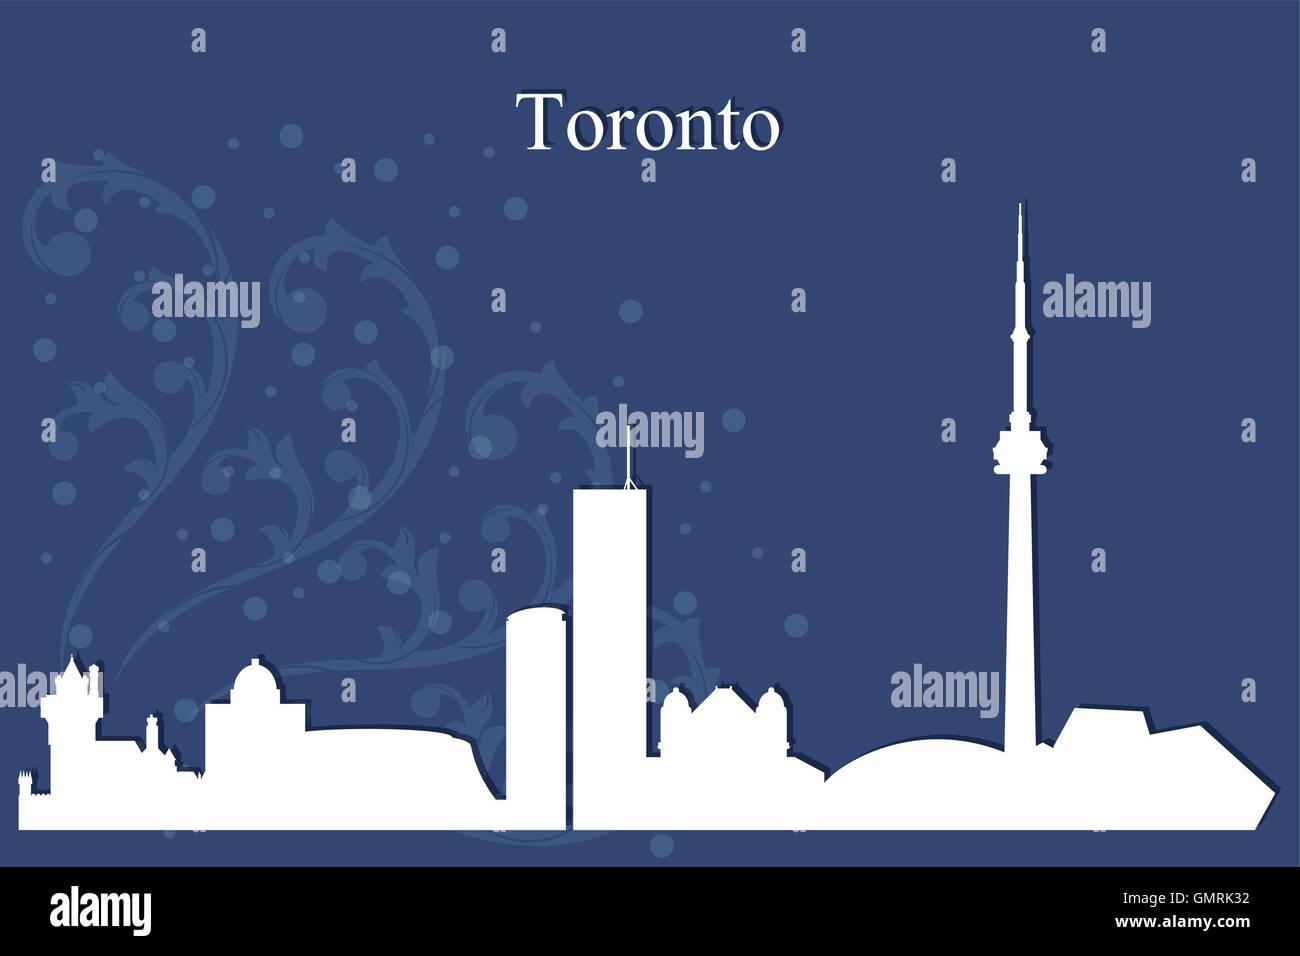 Toronto city skyline silhouette on blue background - Stock Vector